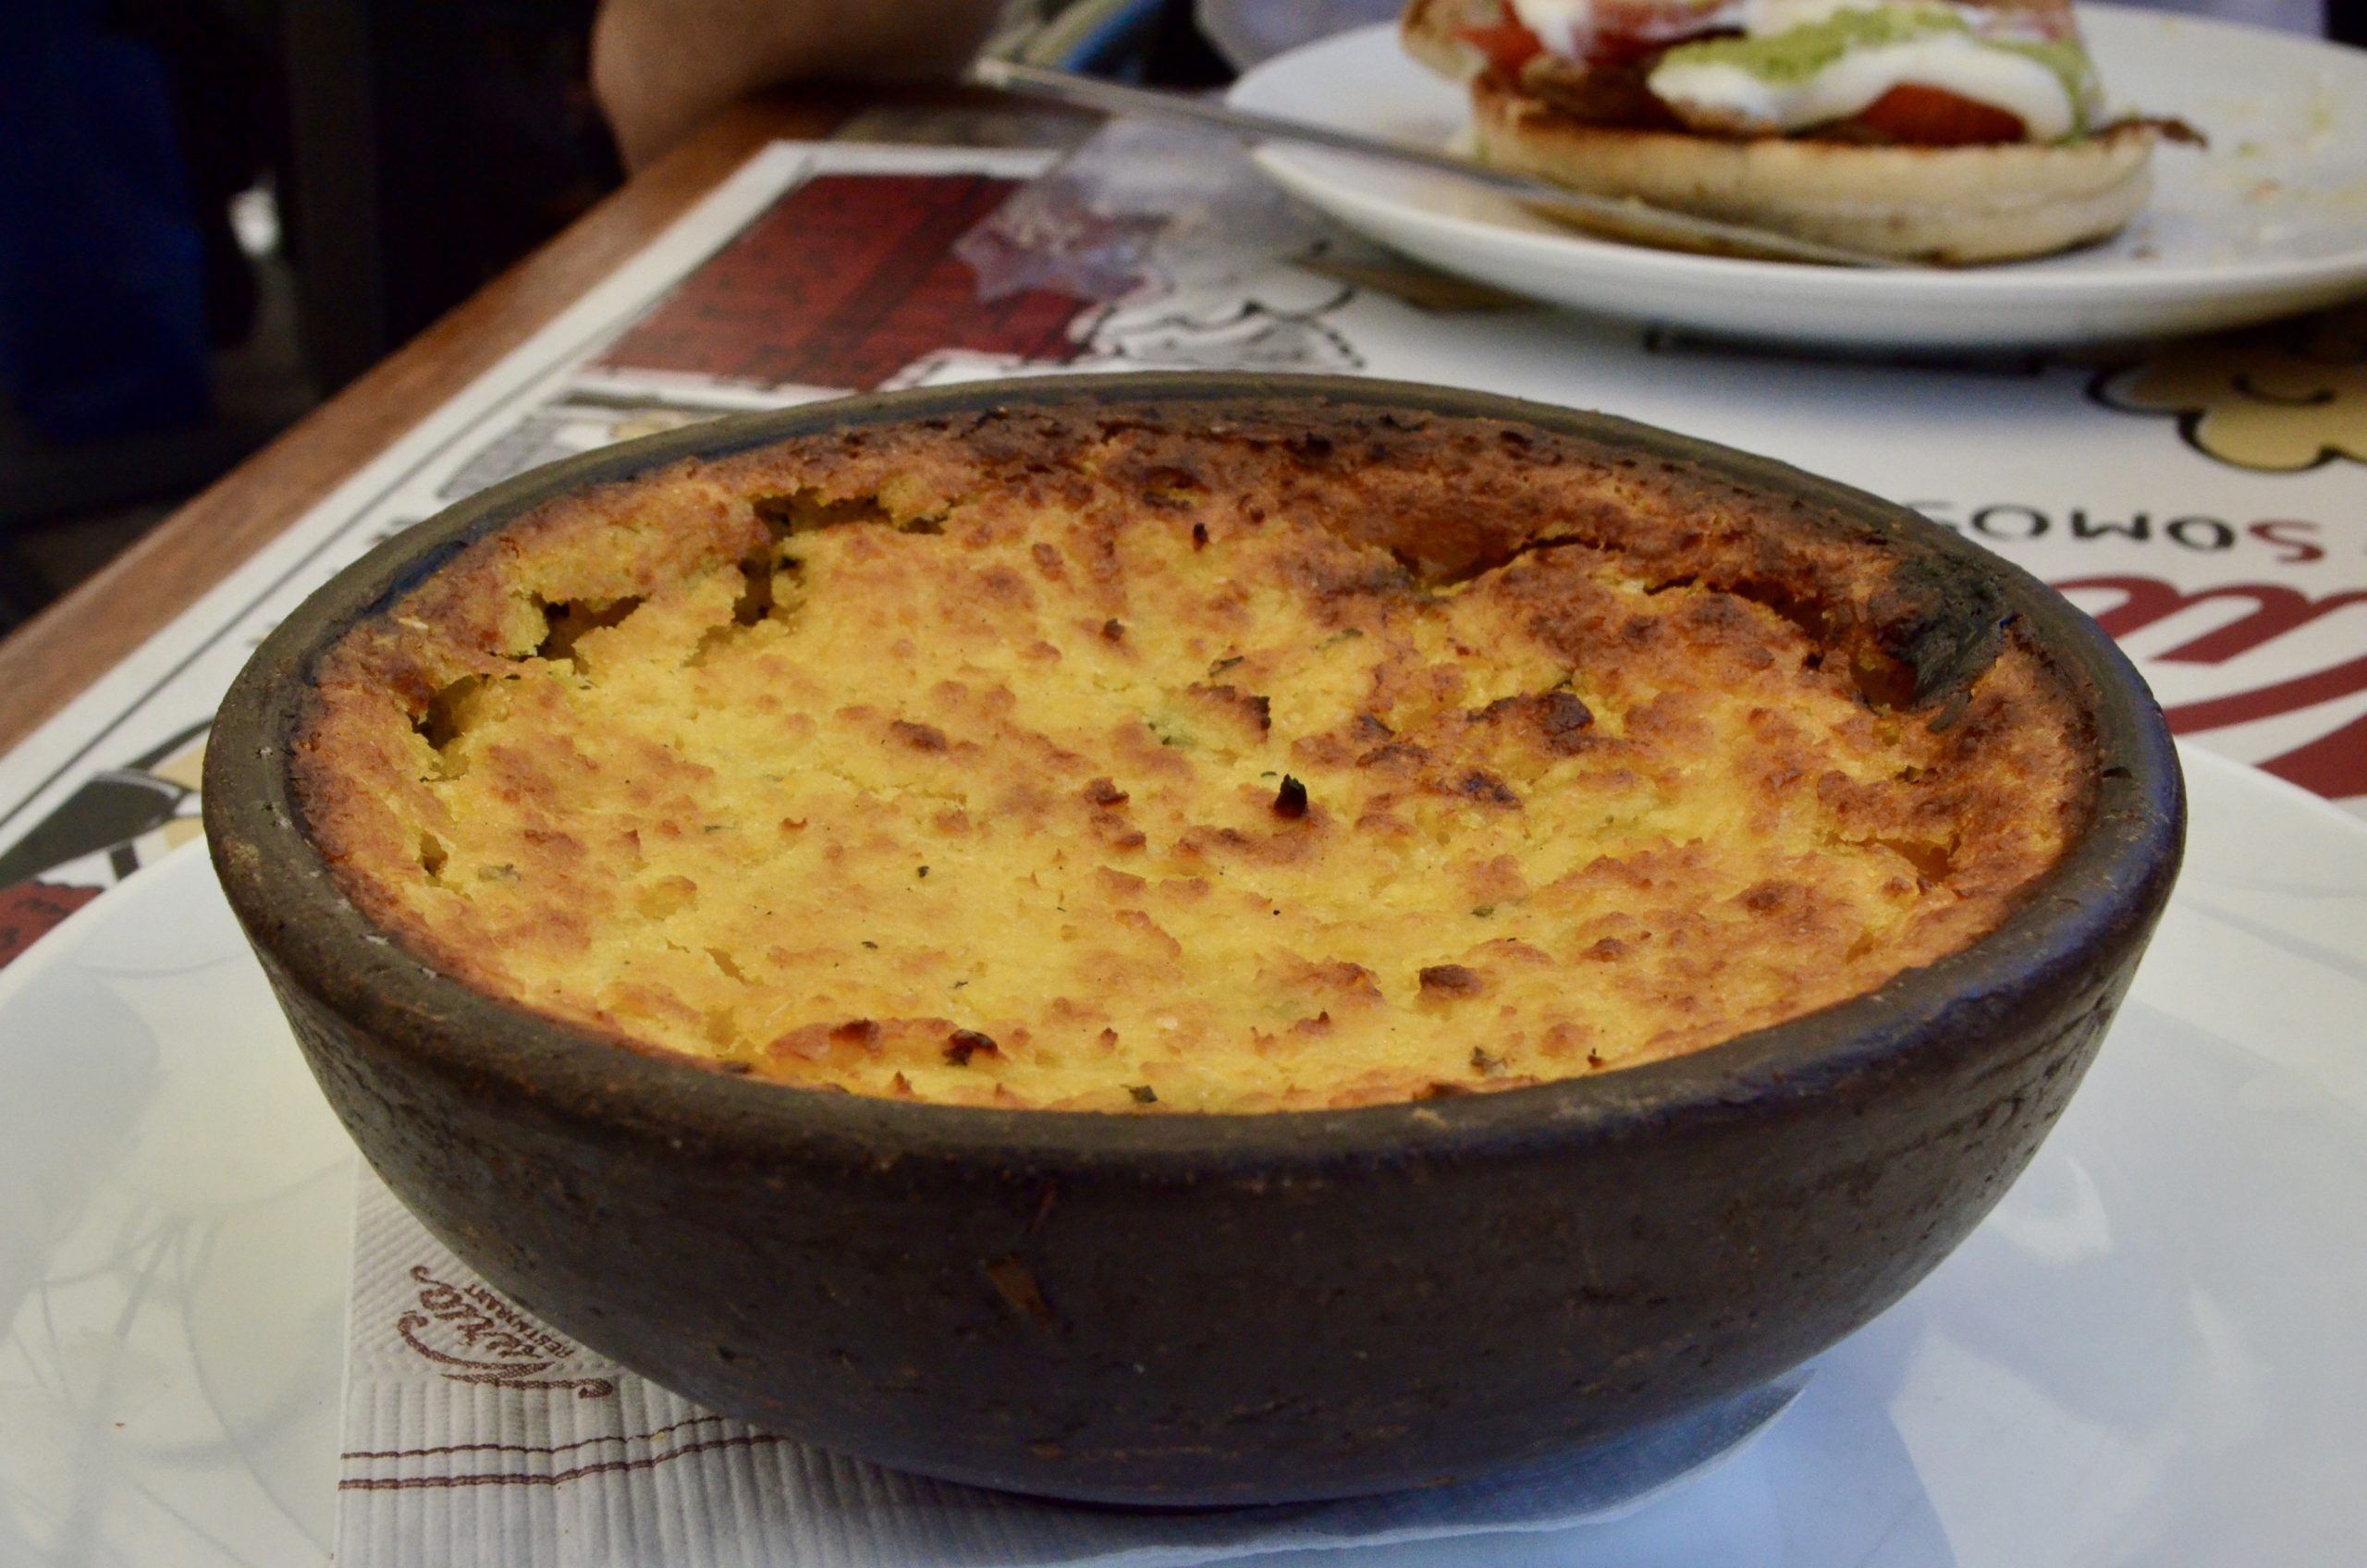 Pastel de choclo – przepis teściowej!